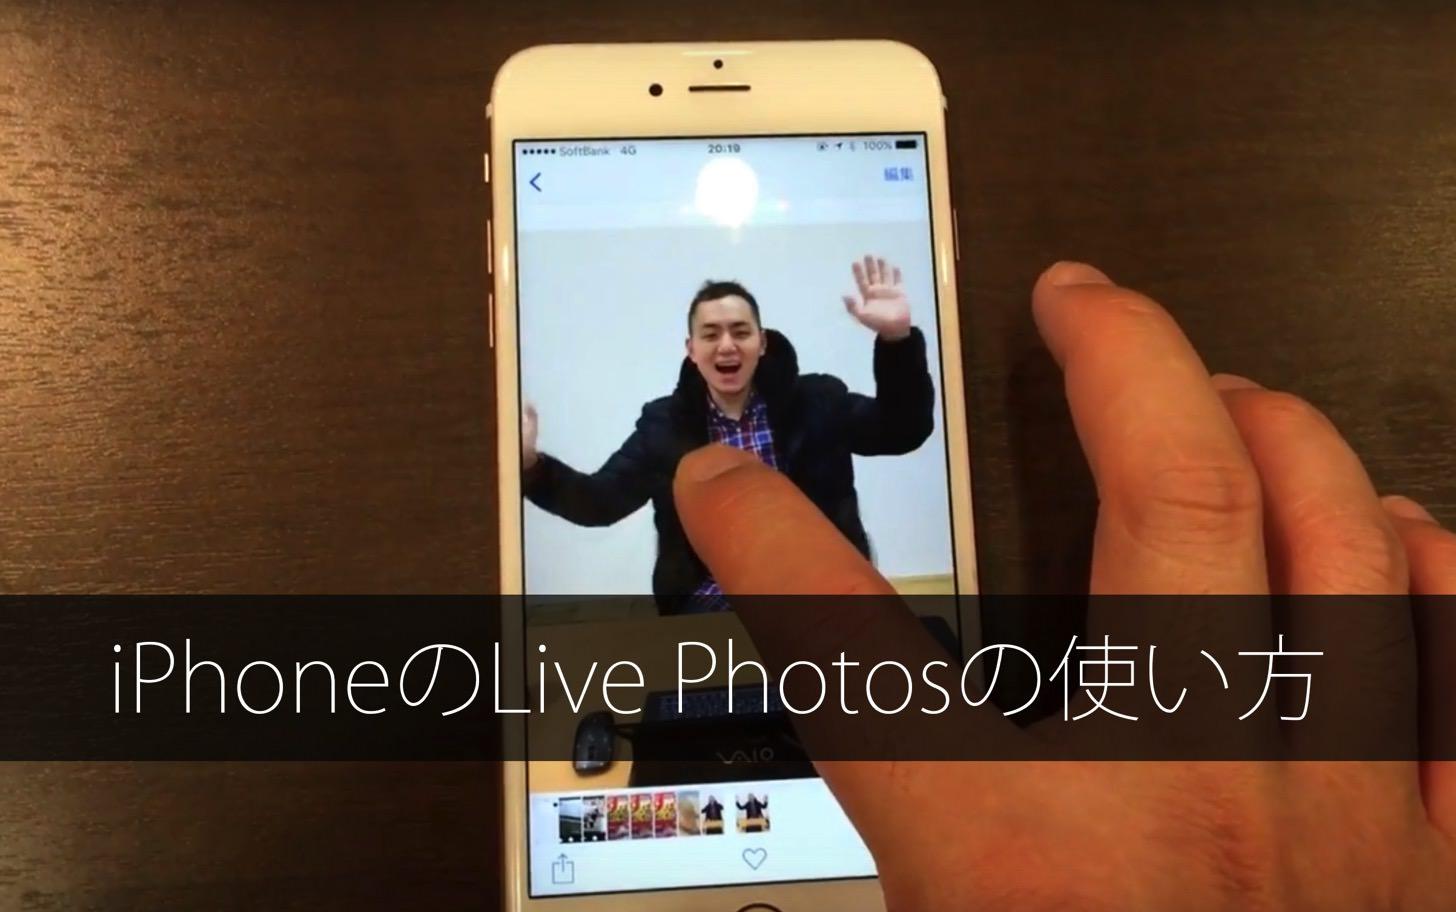 iPhoneのLive Photos(ライブフォト)撮影の使い方。